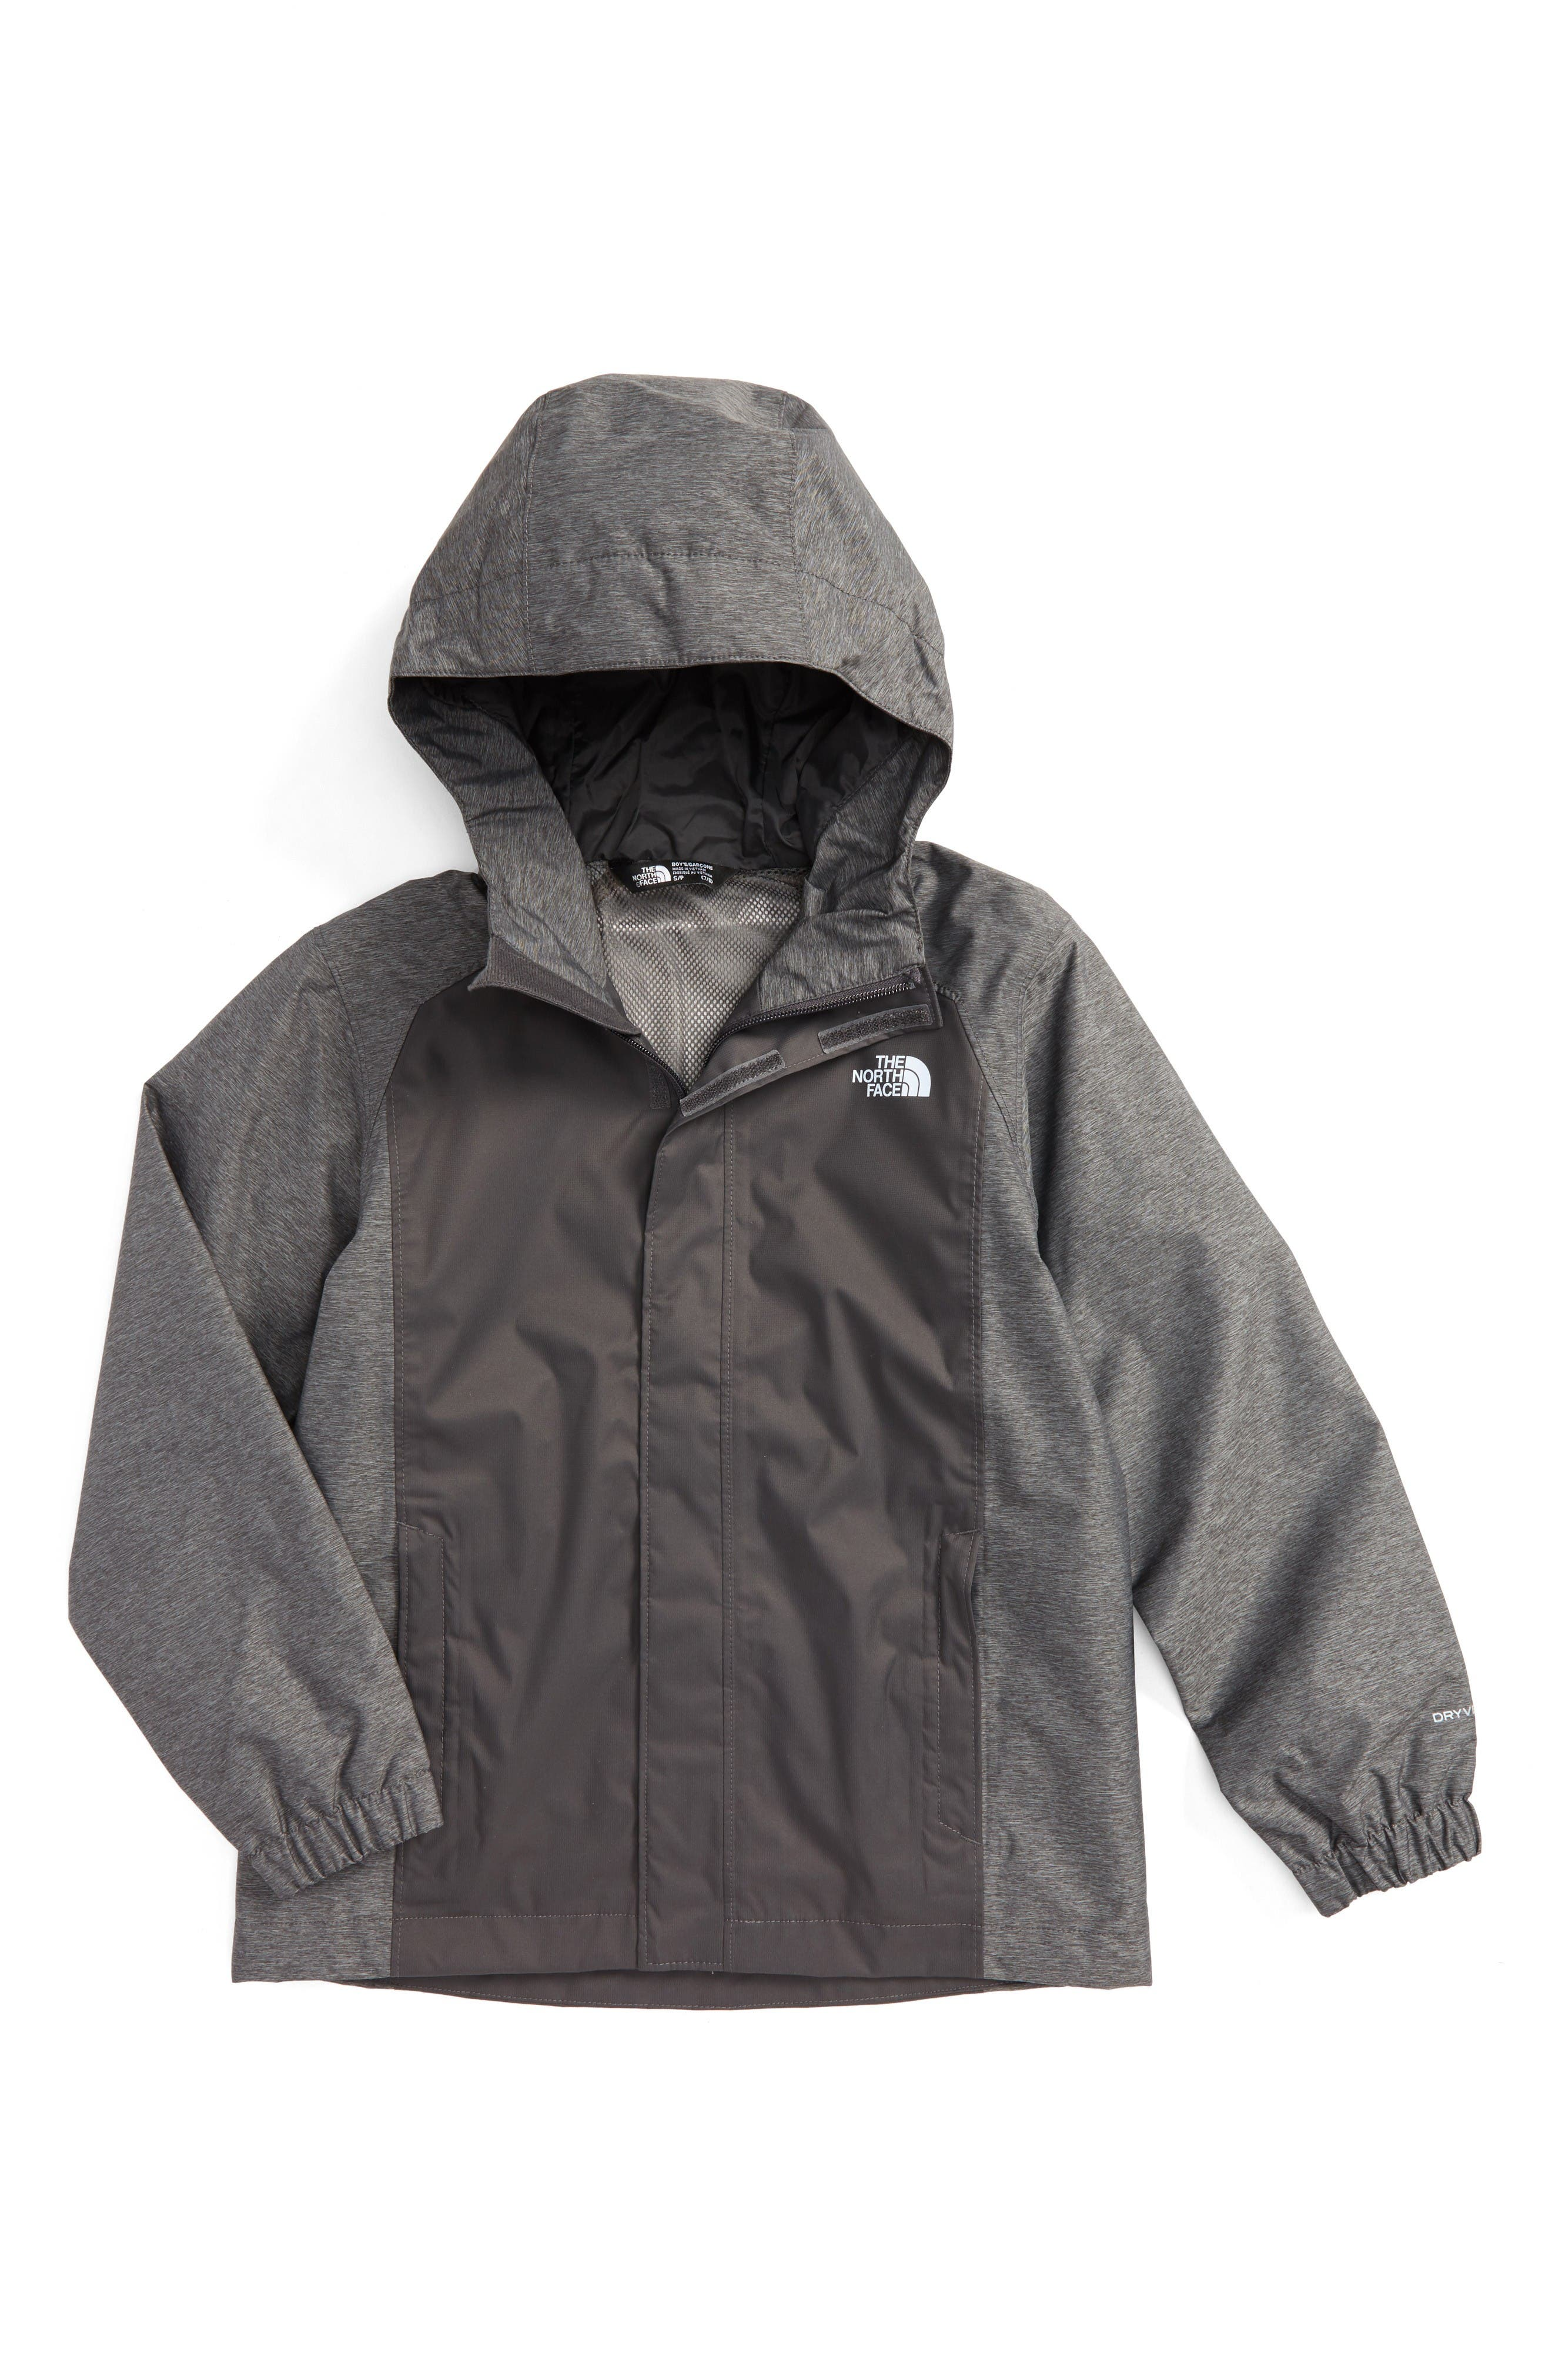 The North Face 'Resolve' Waterproof Jacket (Big Boys)